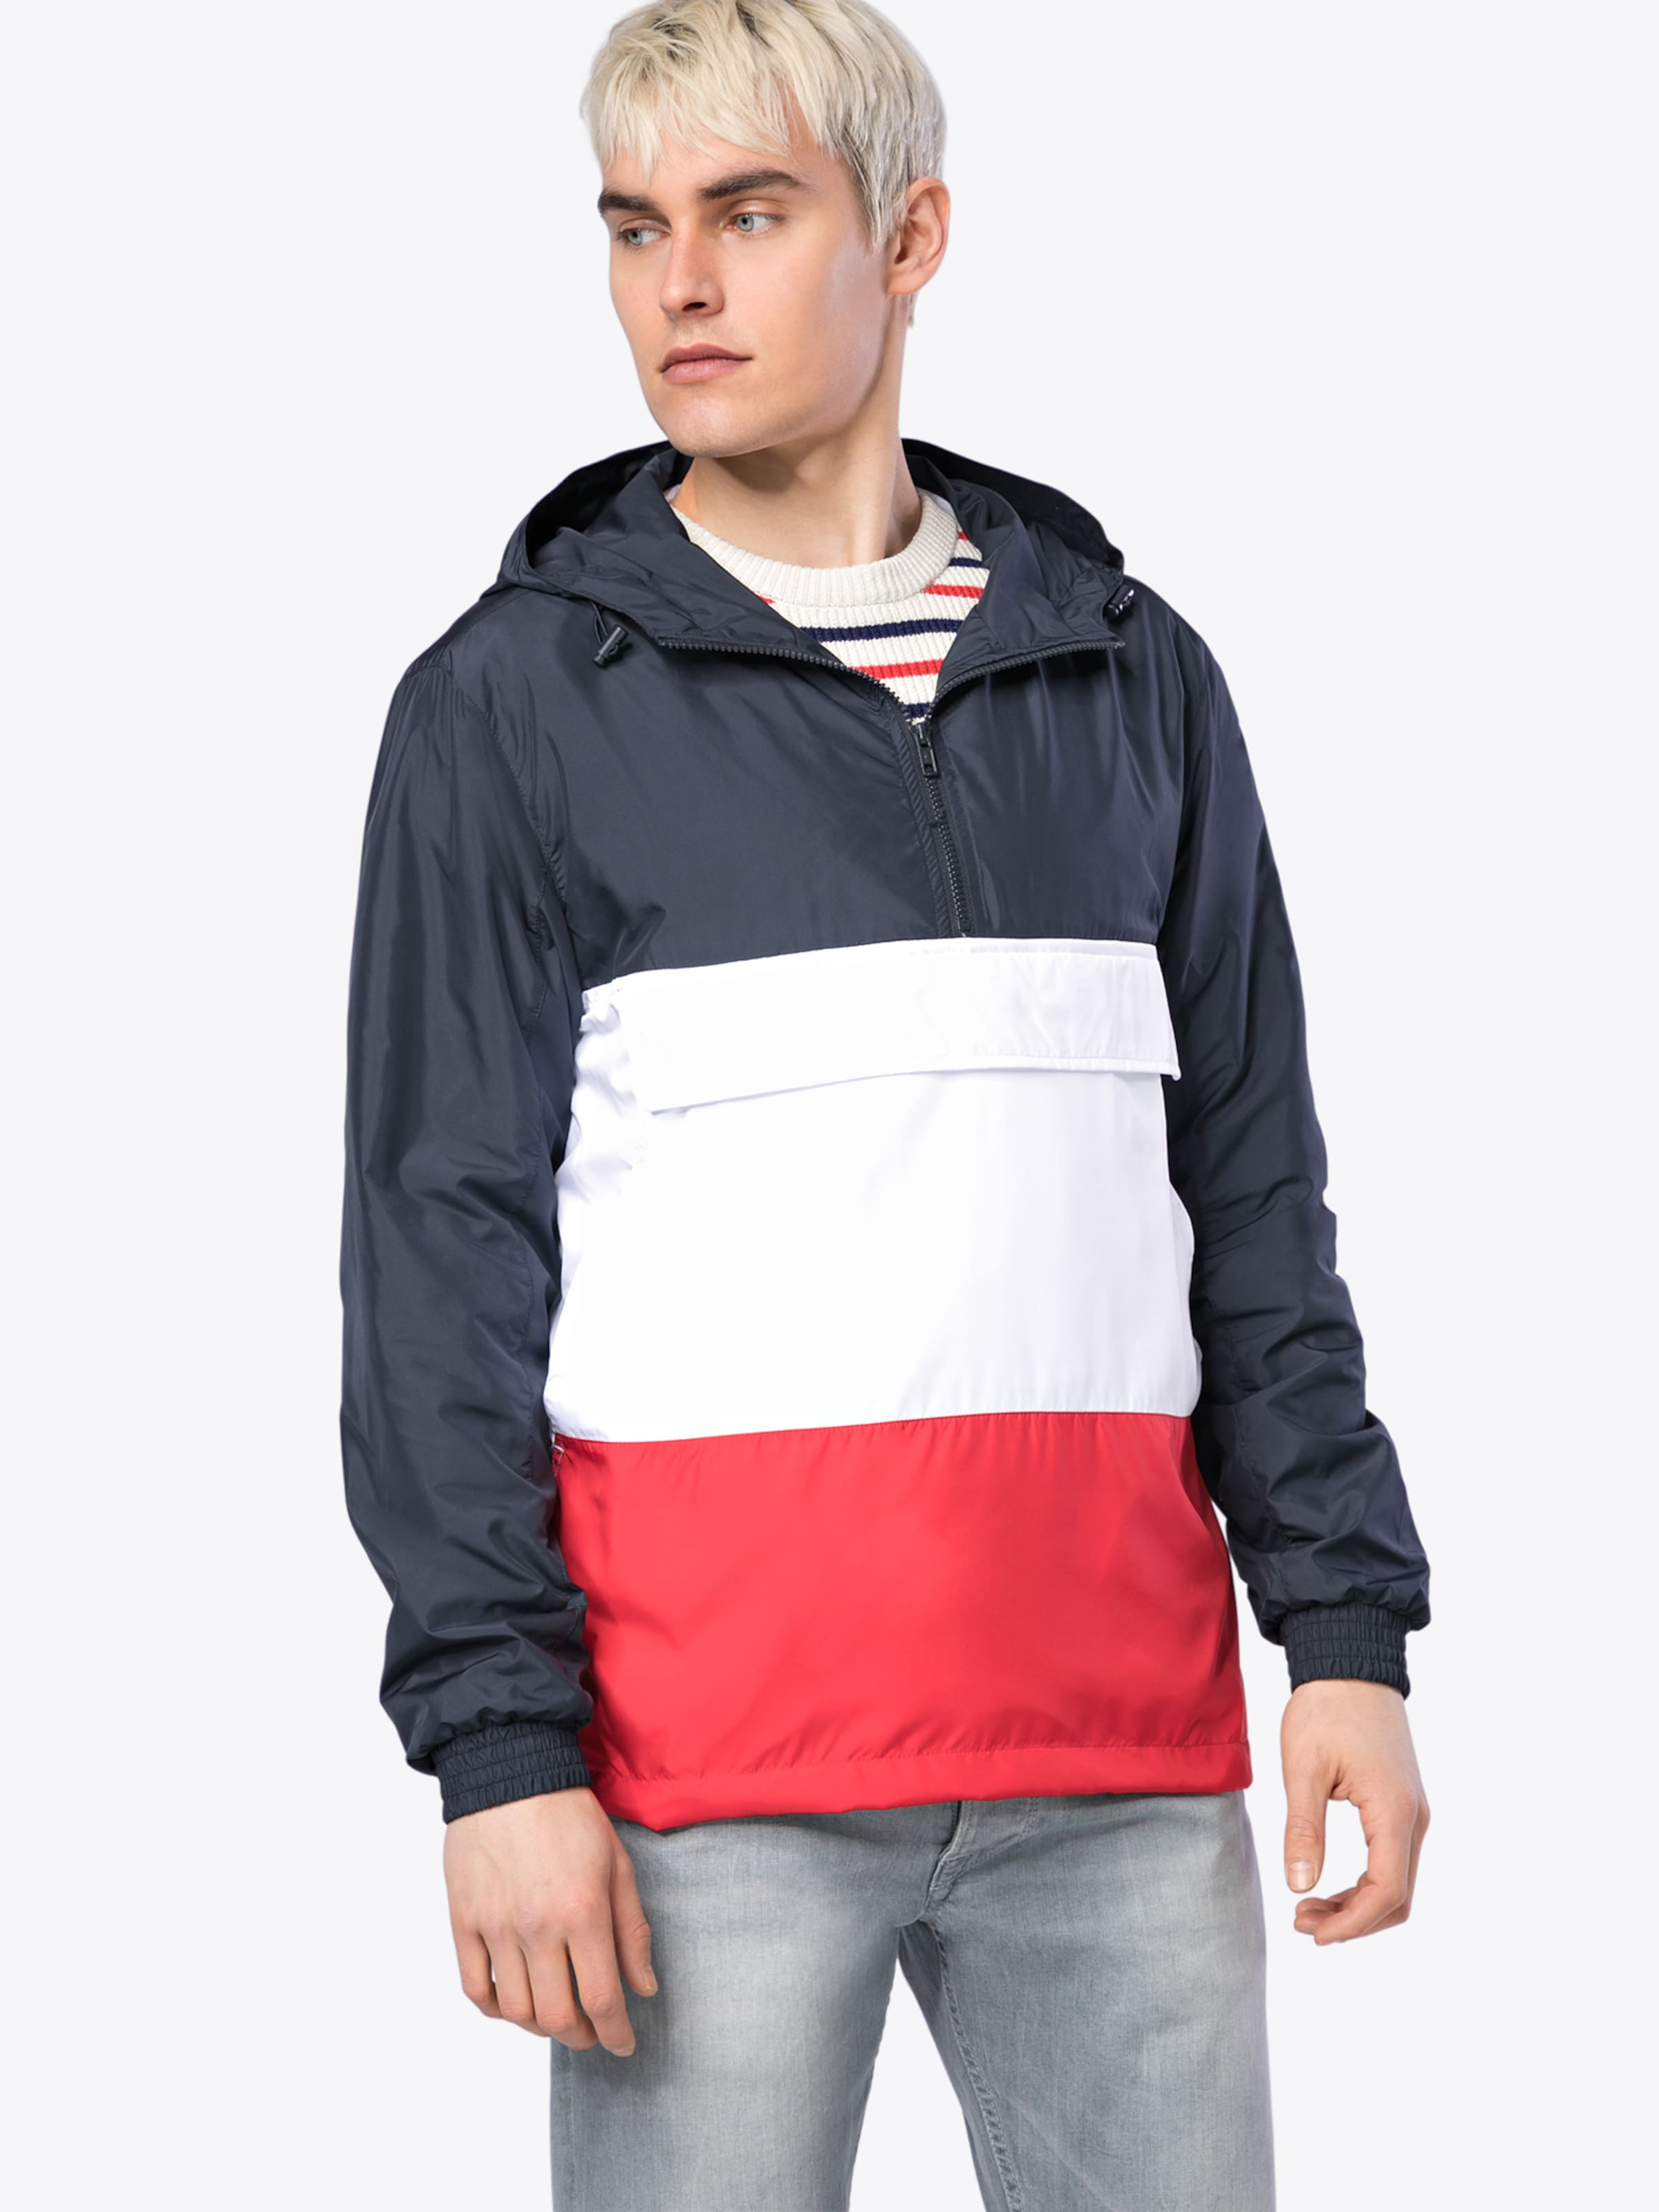 Jacke Pullover Weiß Block In Urban 'color Classics Jacket' NavyRot QdtshrCx